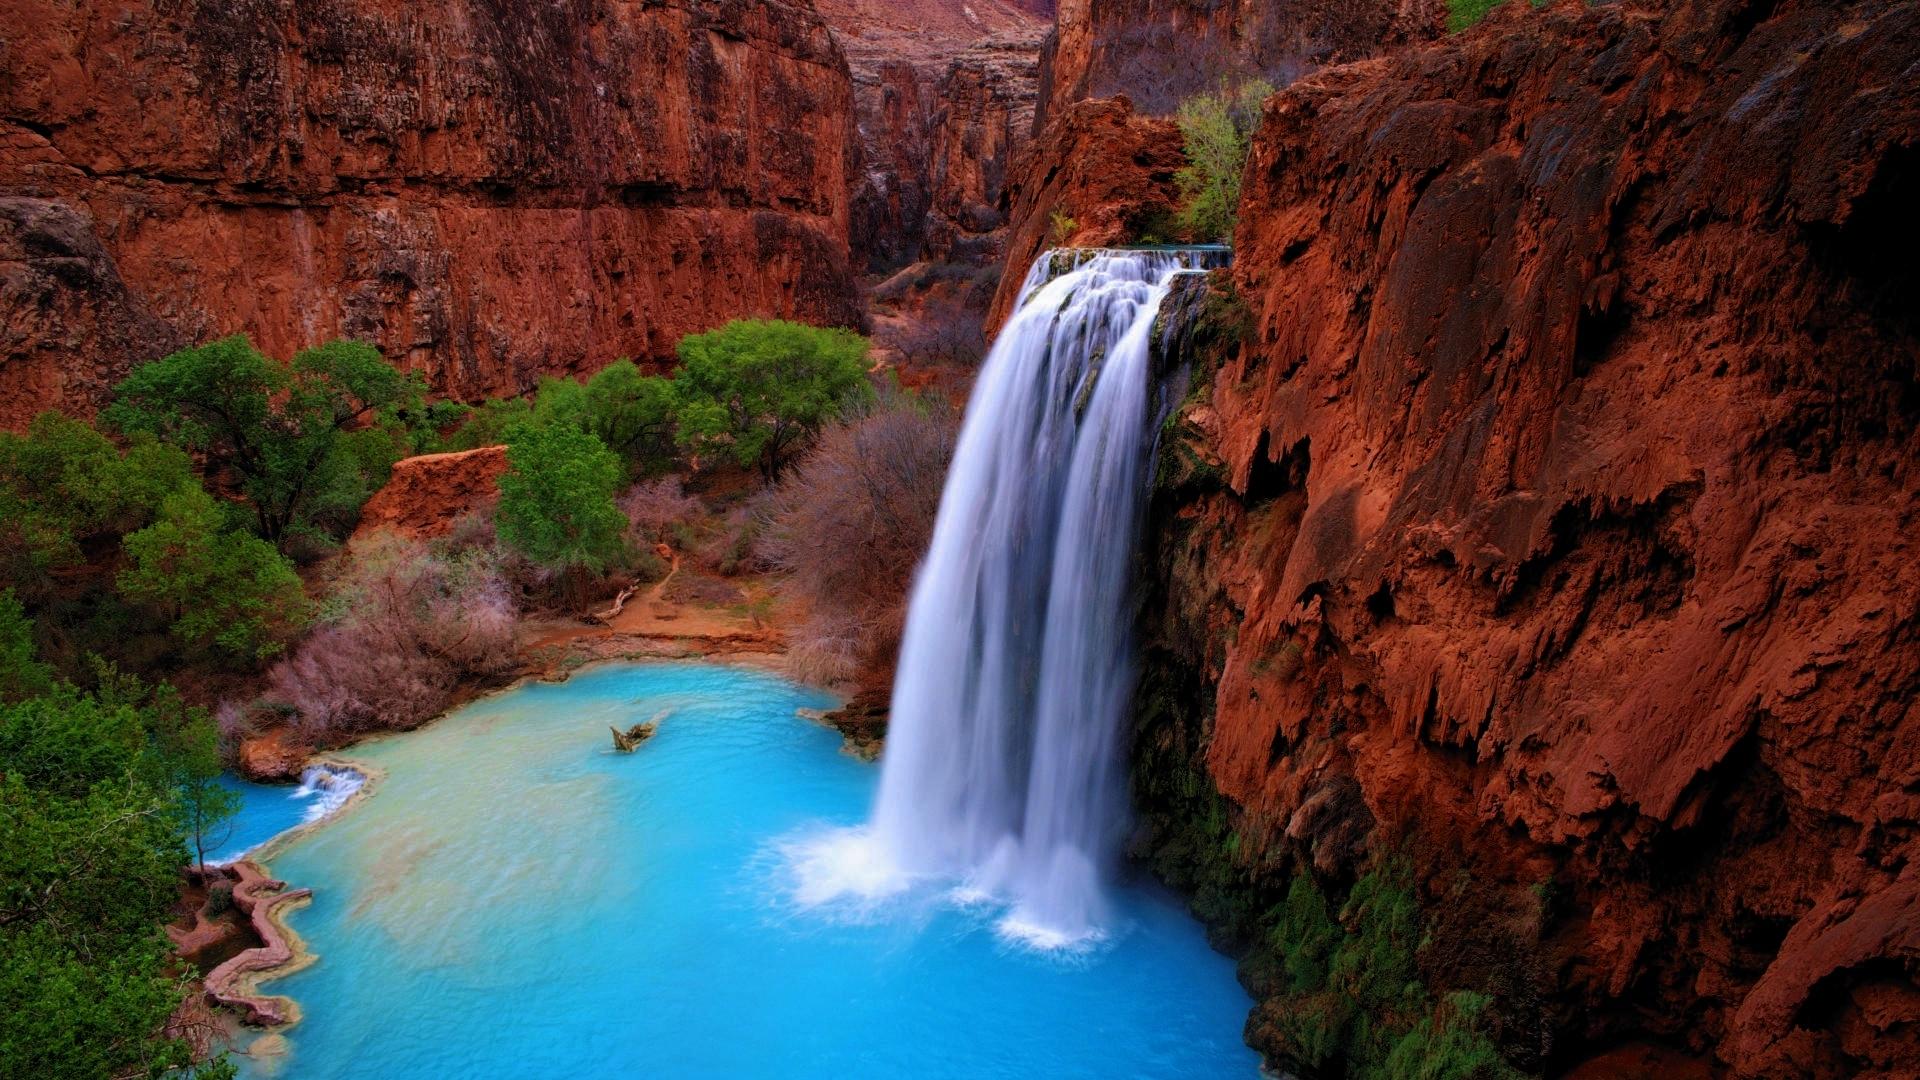 Landscapes waterfalls nature environment wallpaper for Waterfall environment